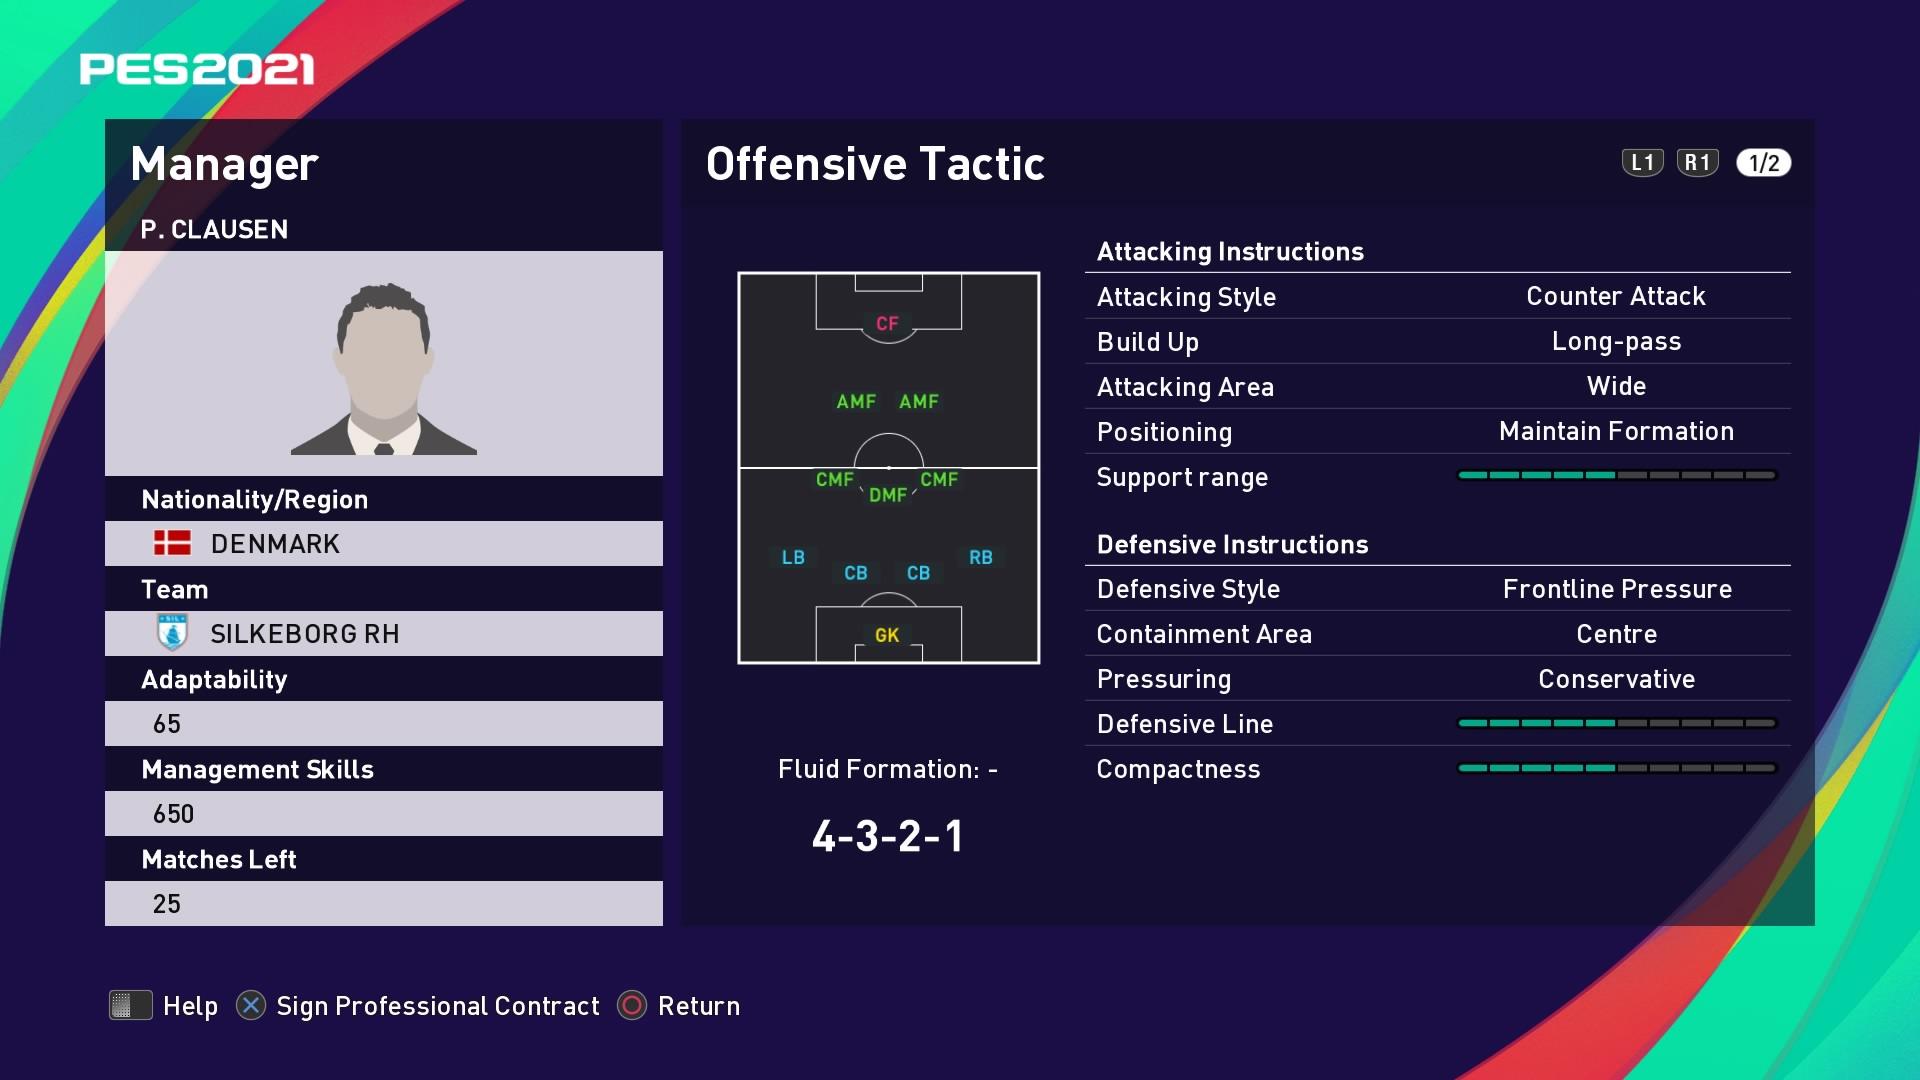 P. Clausen (Kent Nielsen) Offensive Tactic in PES 2021 myClub